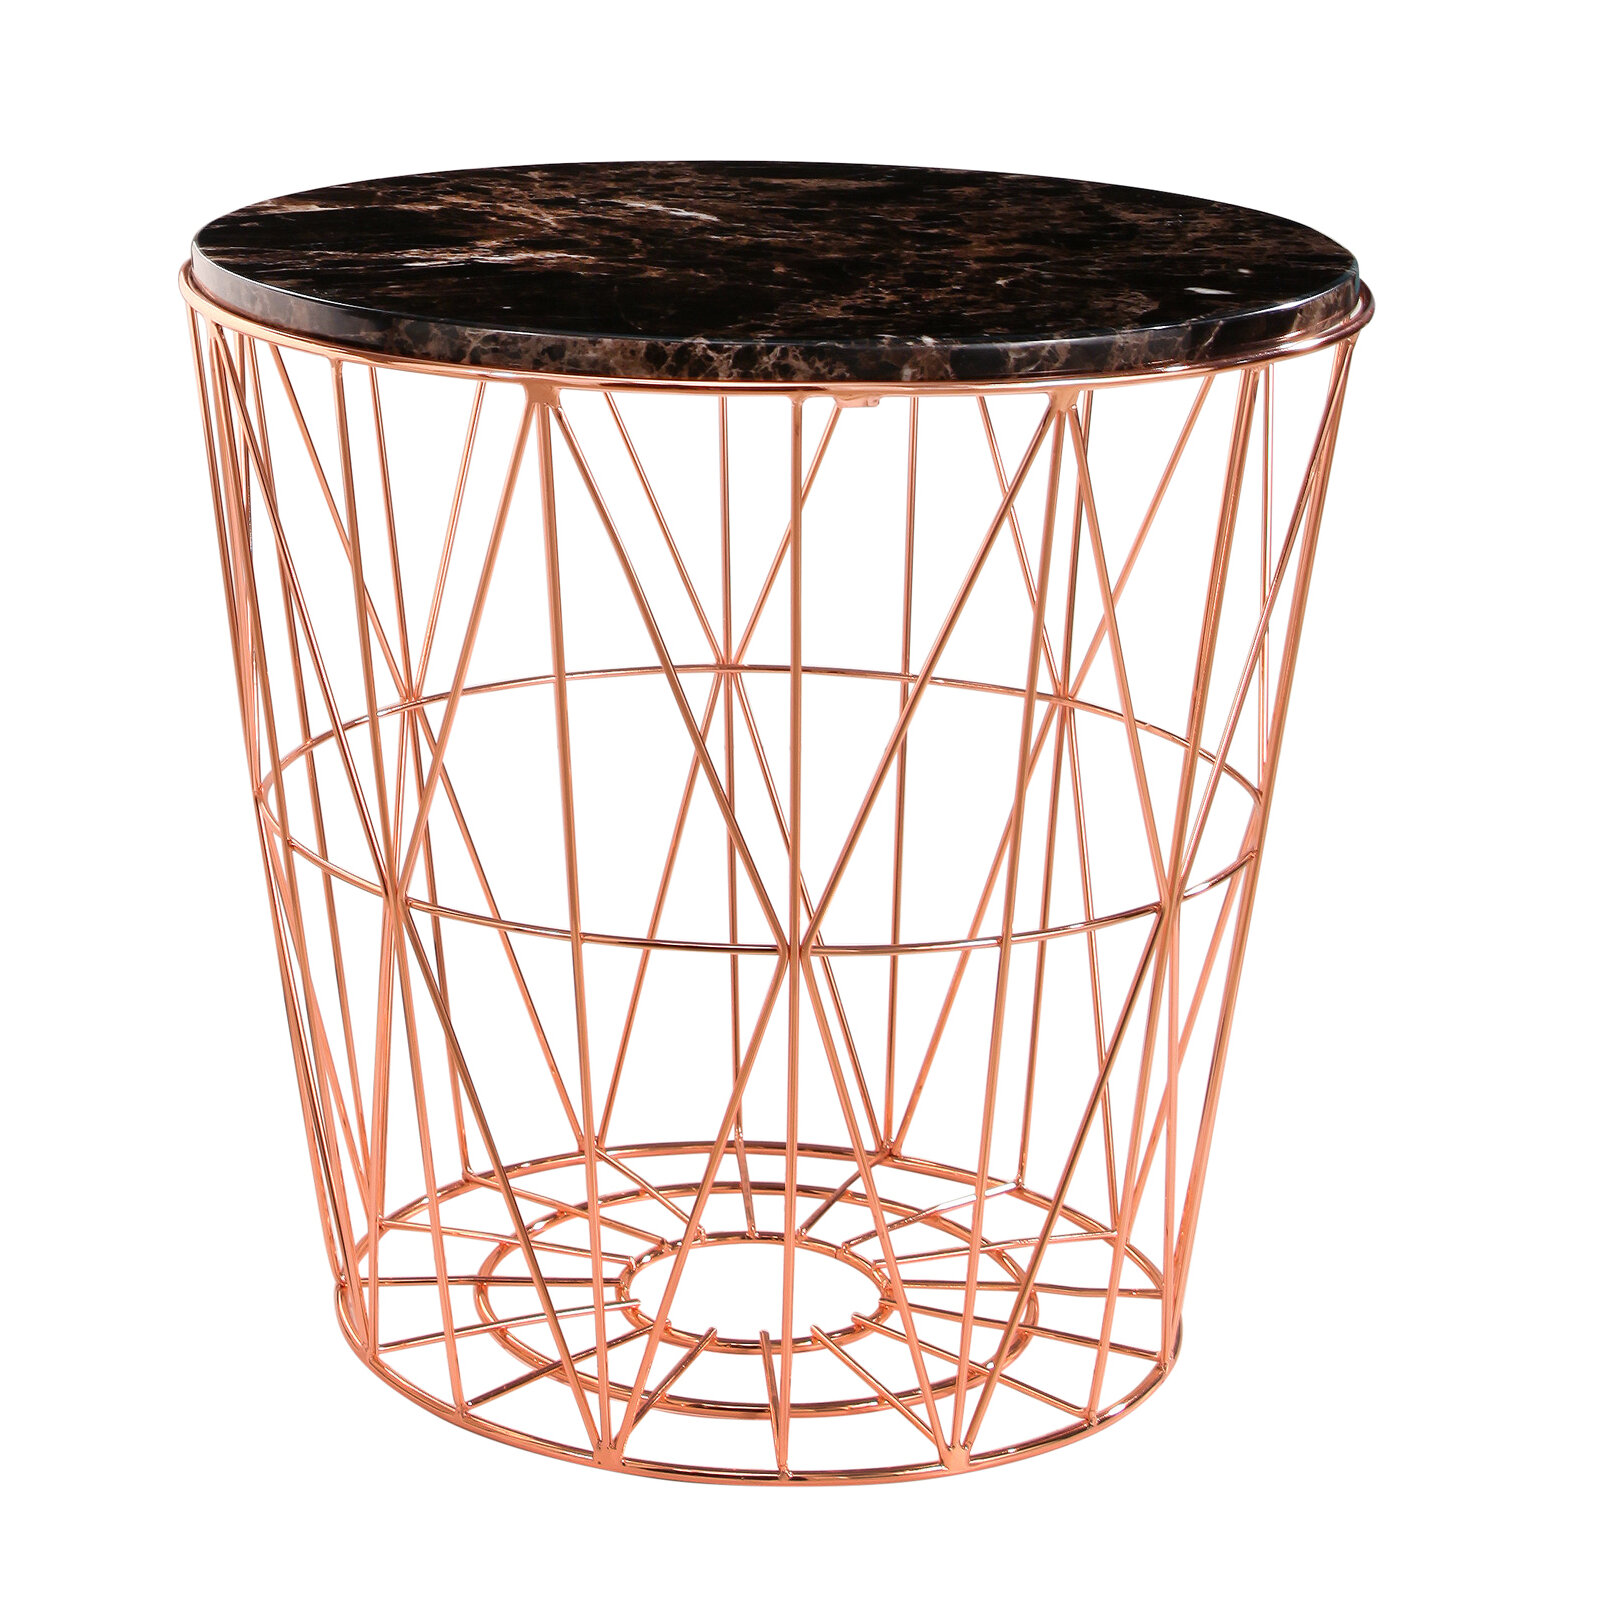 browning furniture. Ivy Bronx Browning Geometric Marble Stainless Steel End Table | Wayfair.ca Furniture B